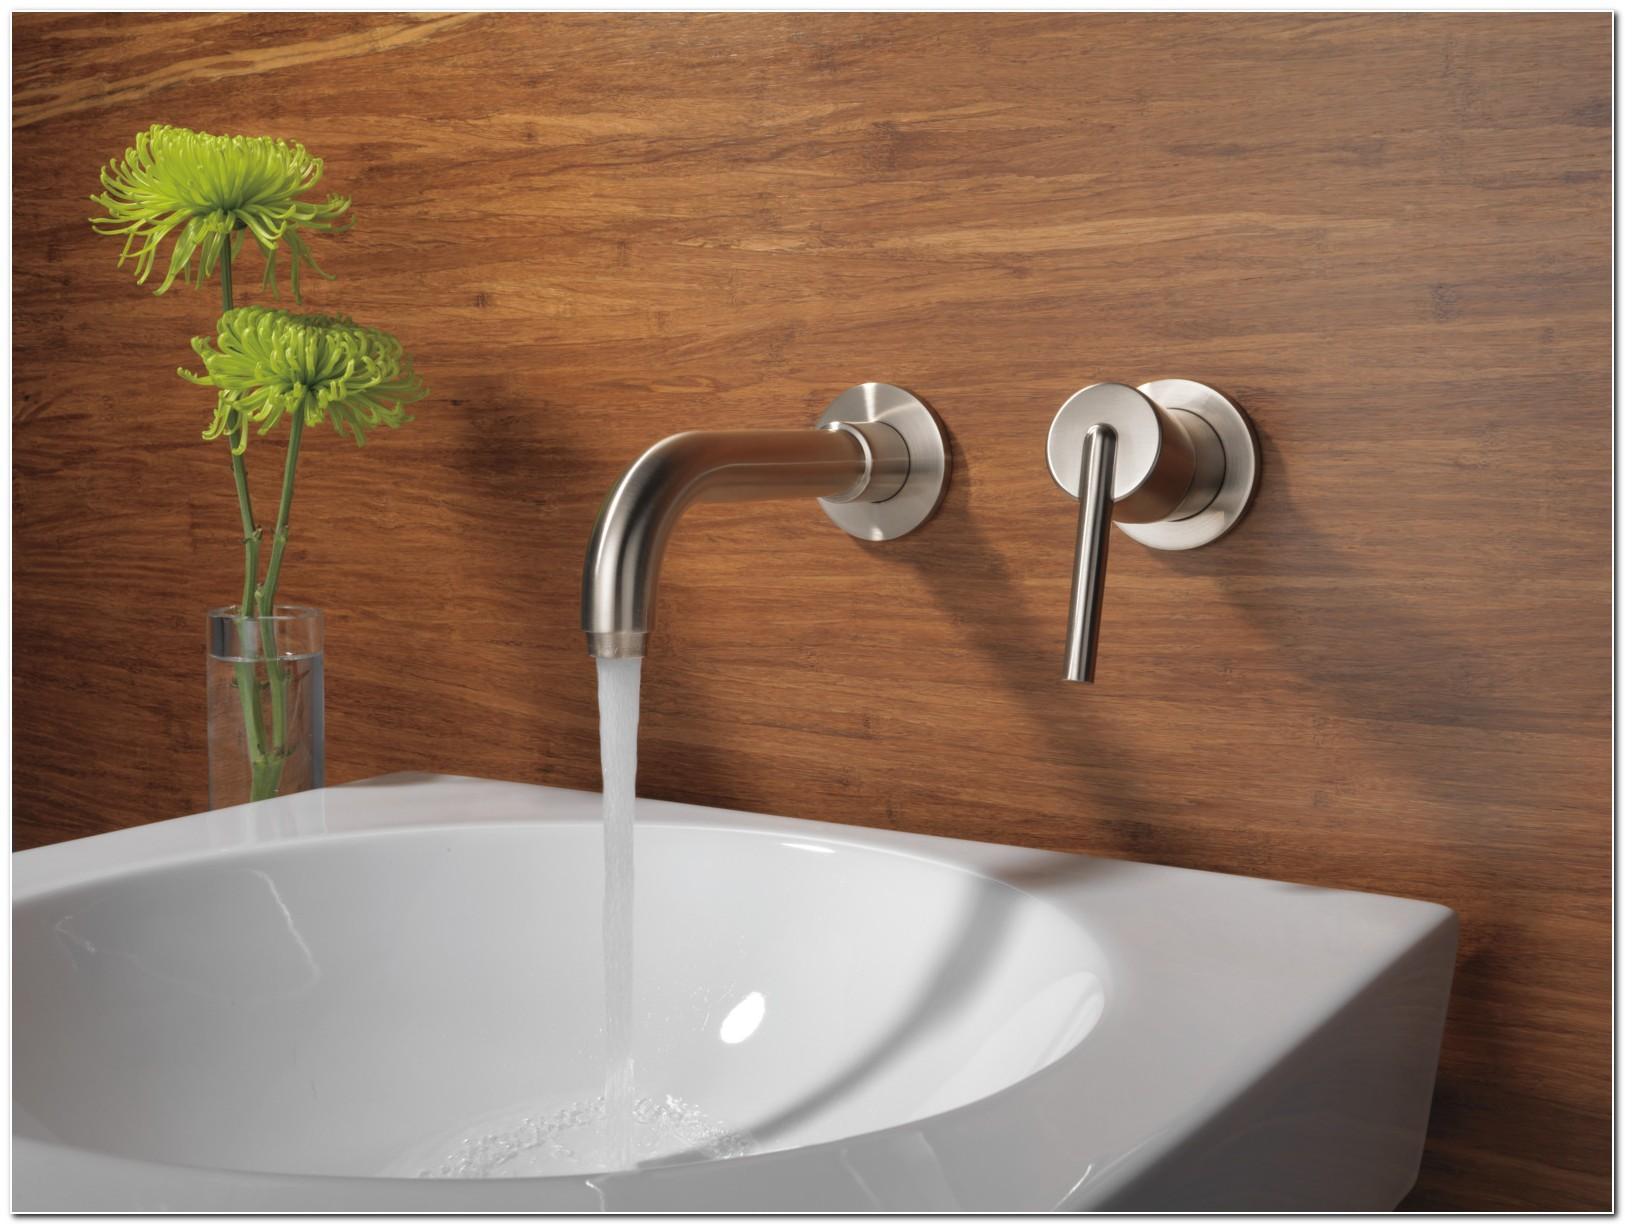 Delta Wall Mount Bathroom Sink Faucet